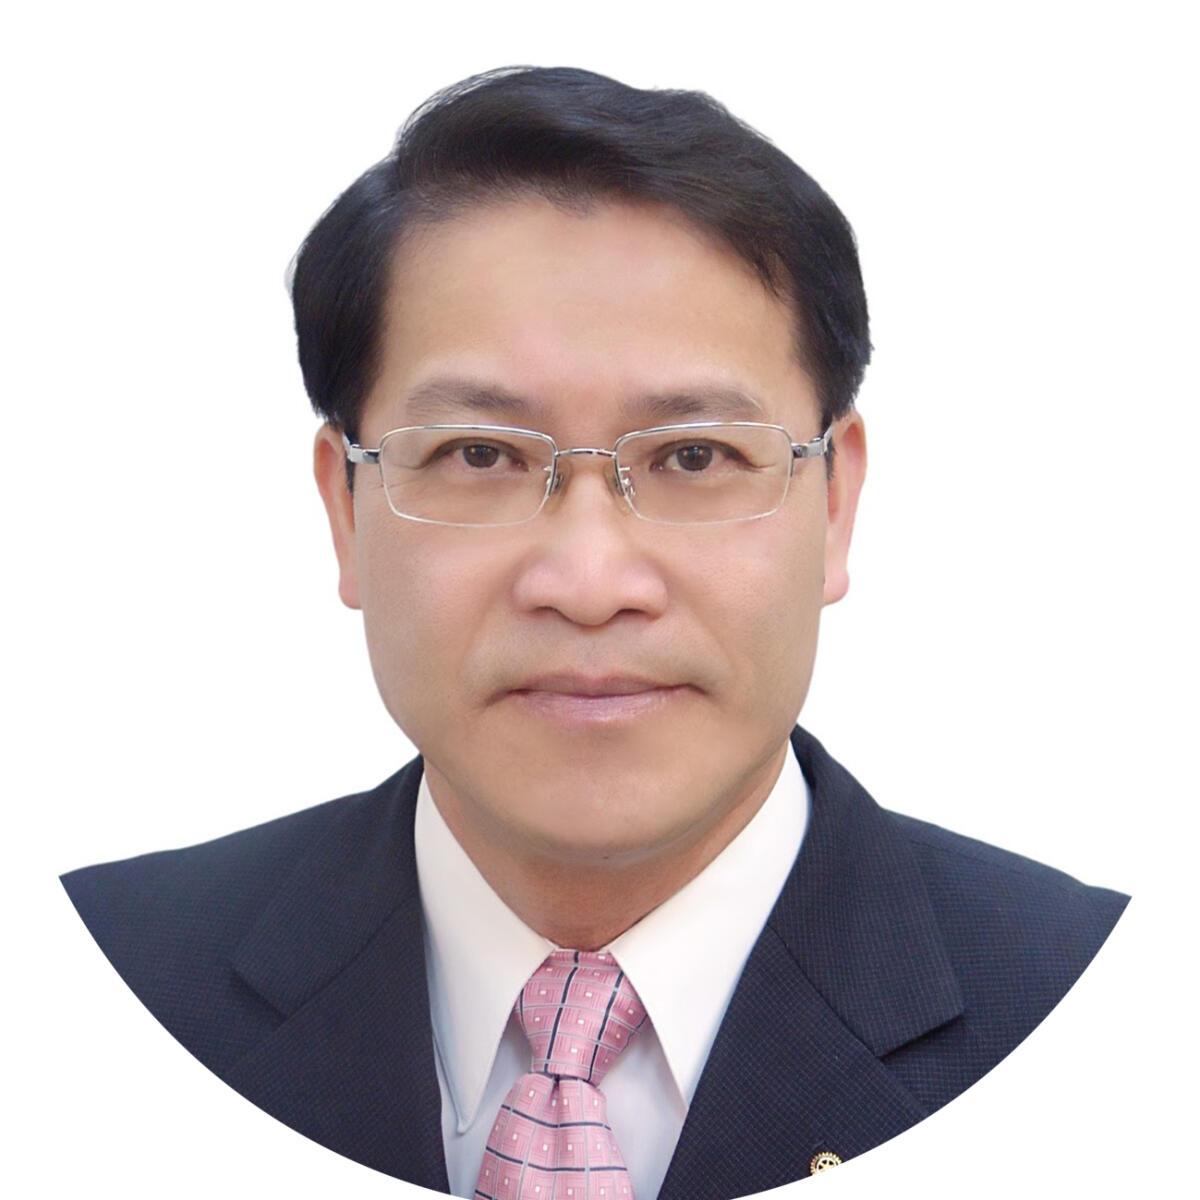 Daniel Liao